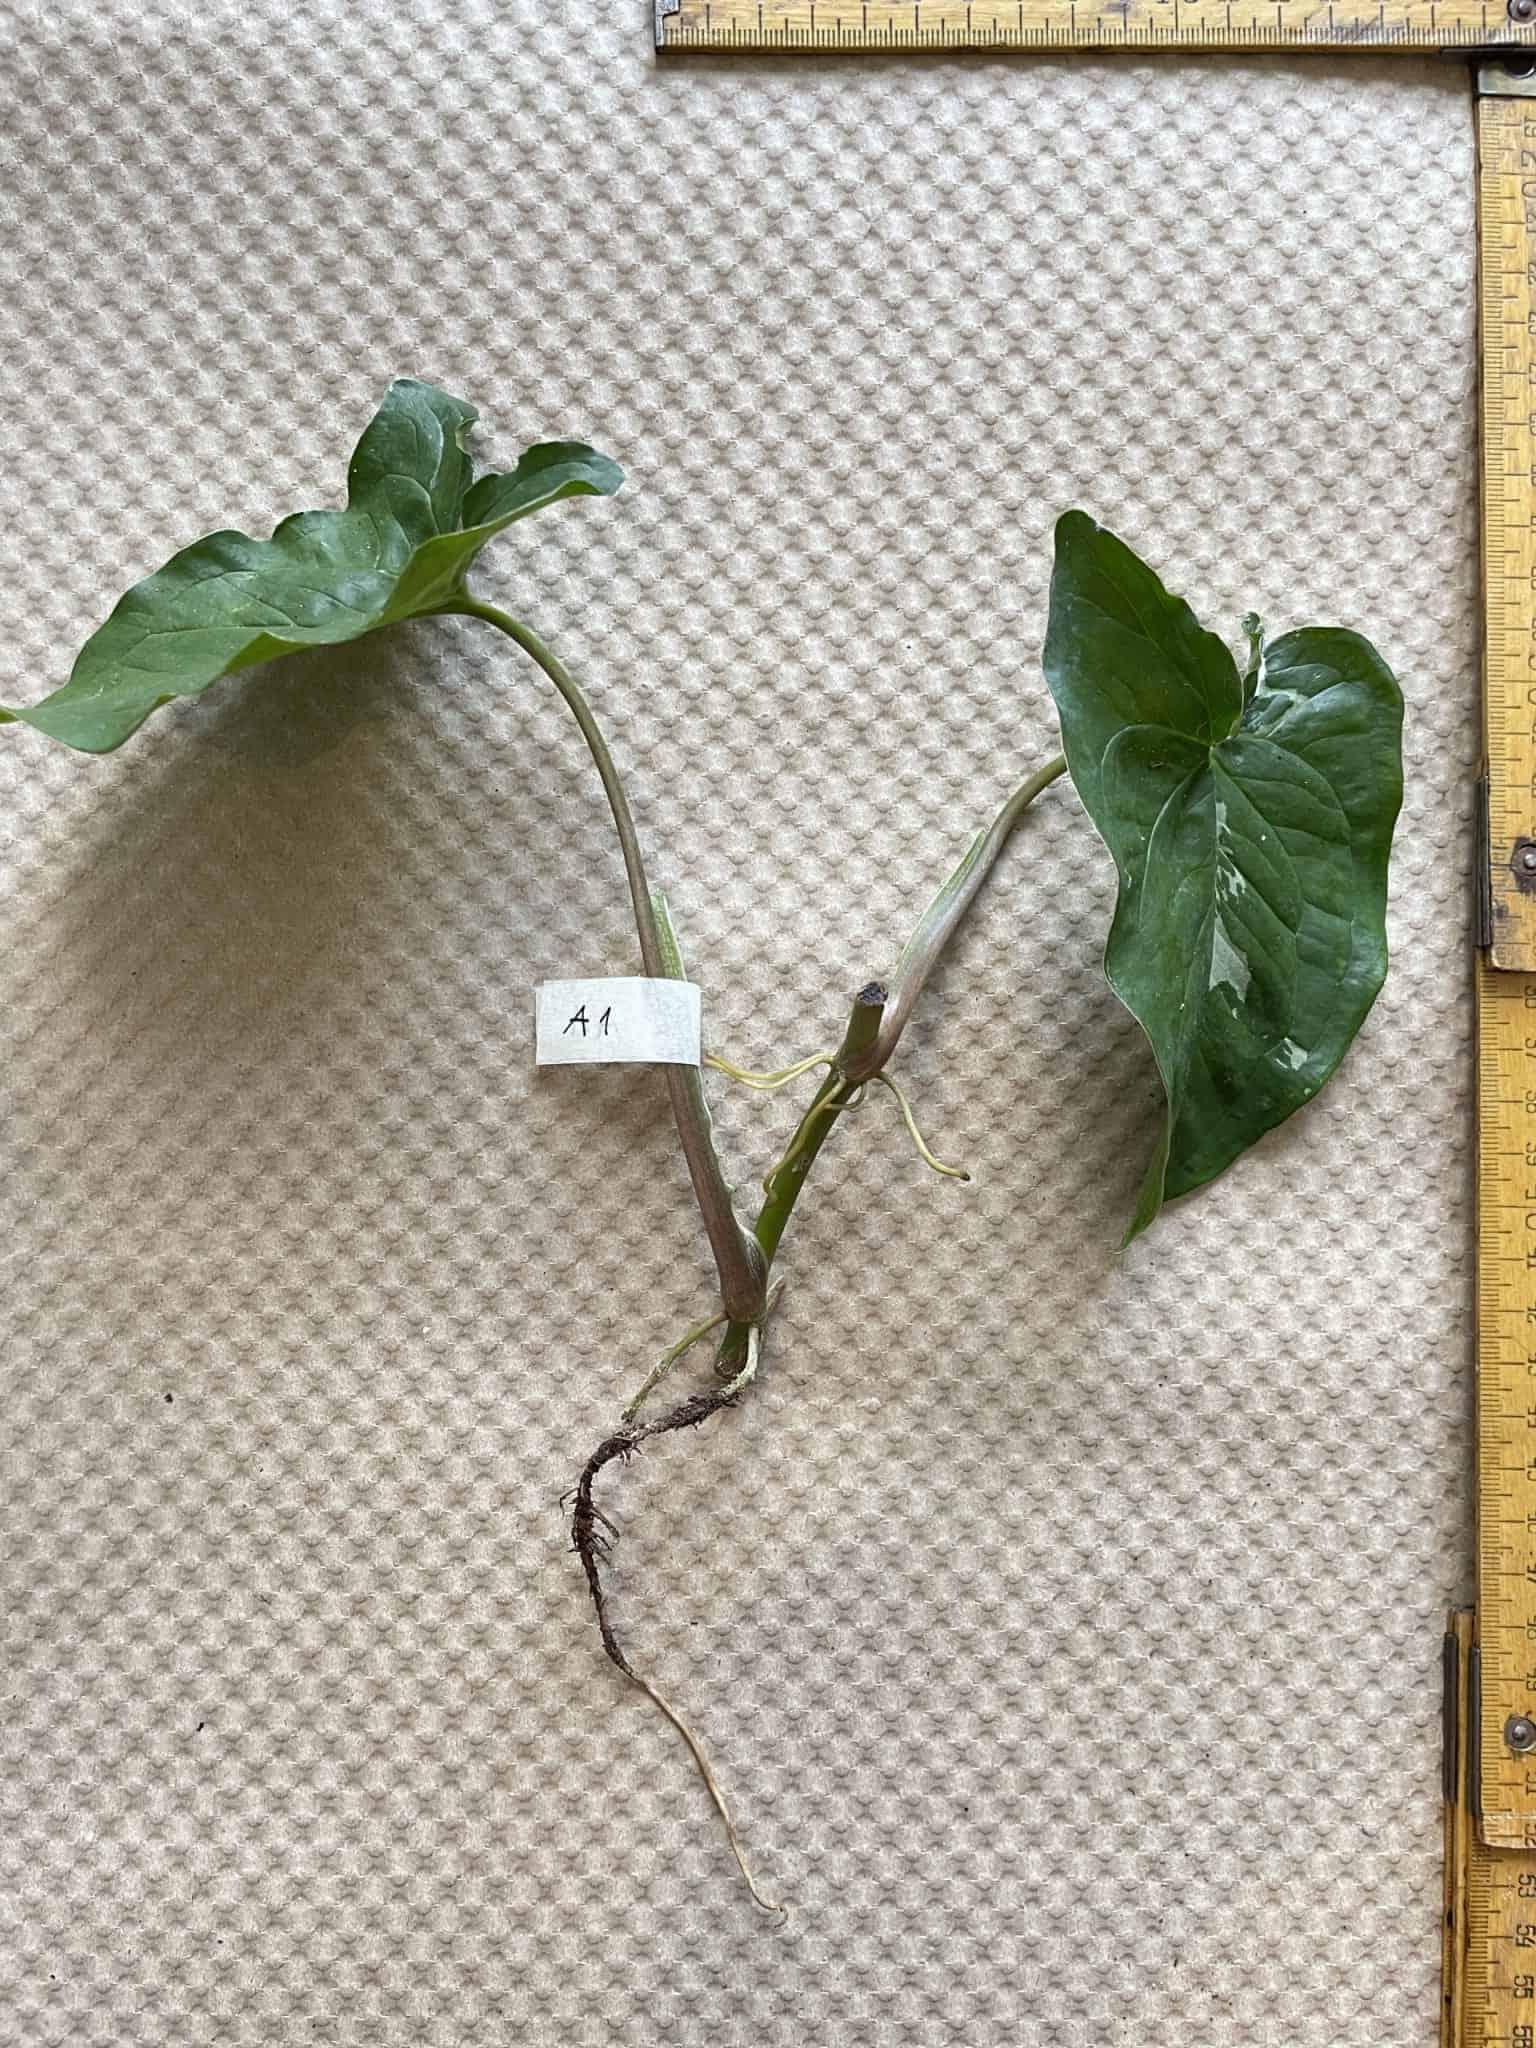 Syngonium Albo Variegata   Arrowhead Plant   Cuttings Cuttings 15